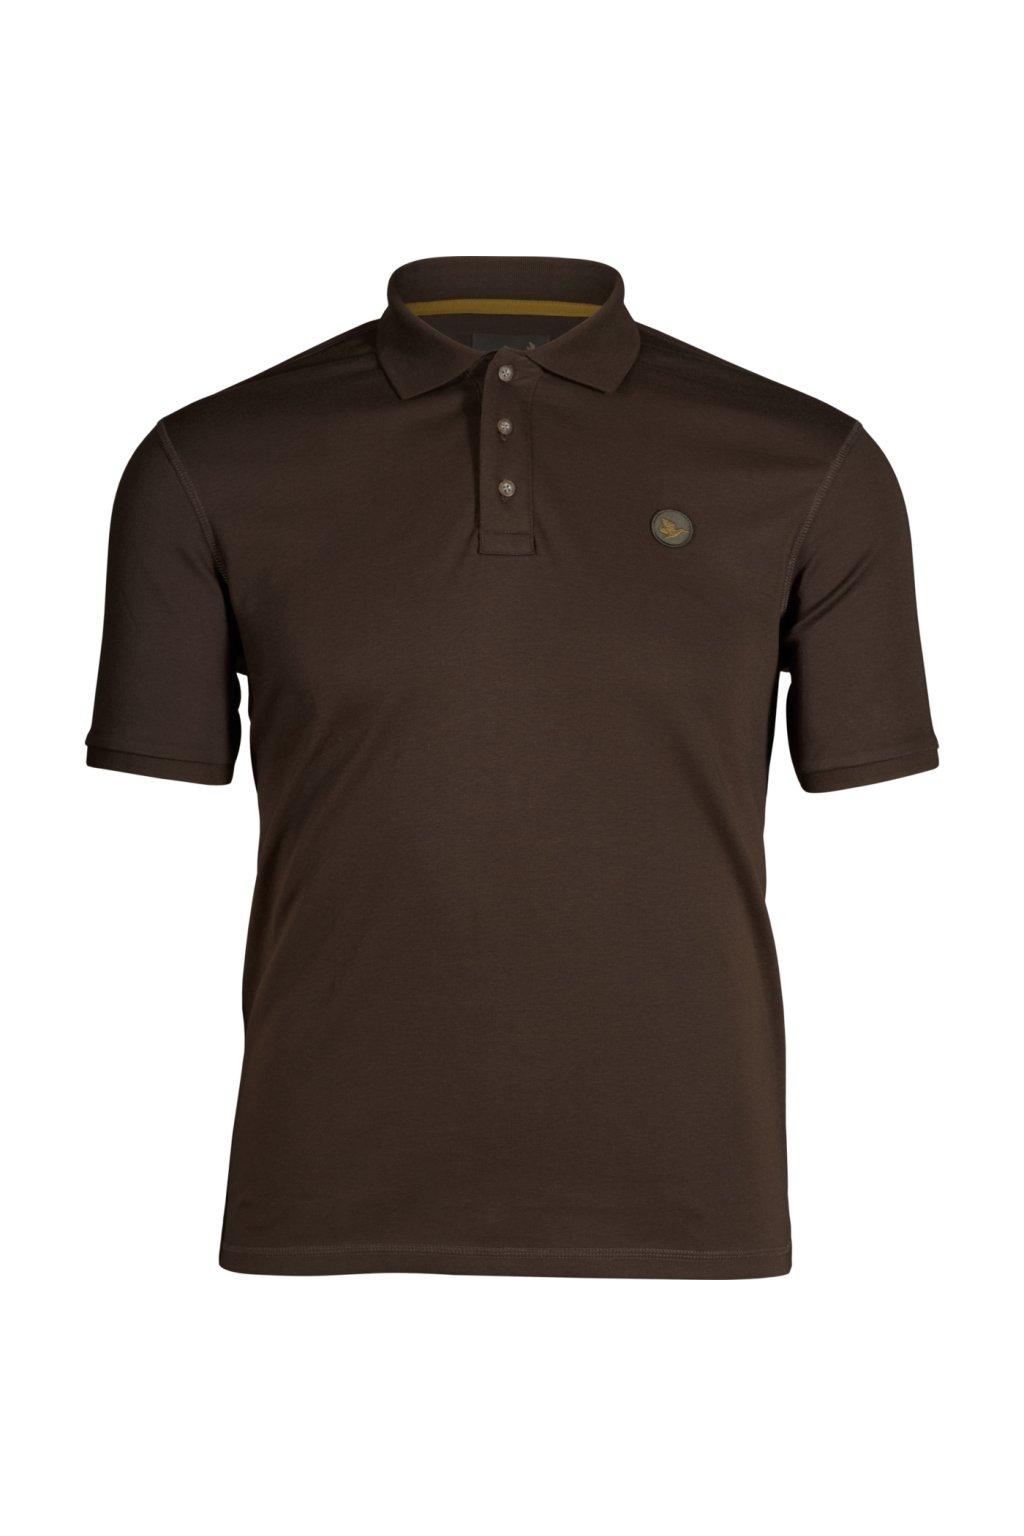 Seeland - Skeet Polo triko pánské Classic Brown